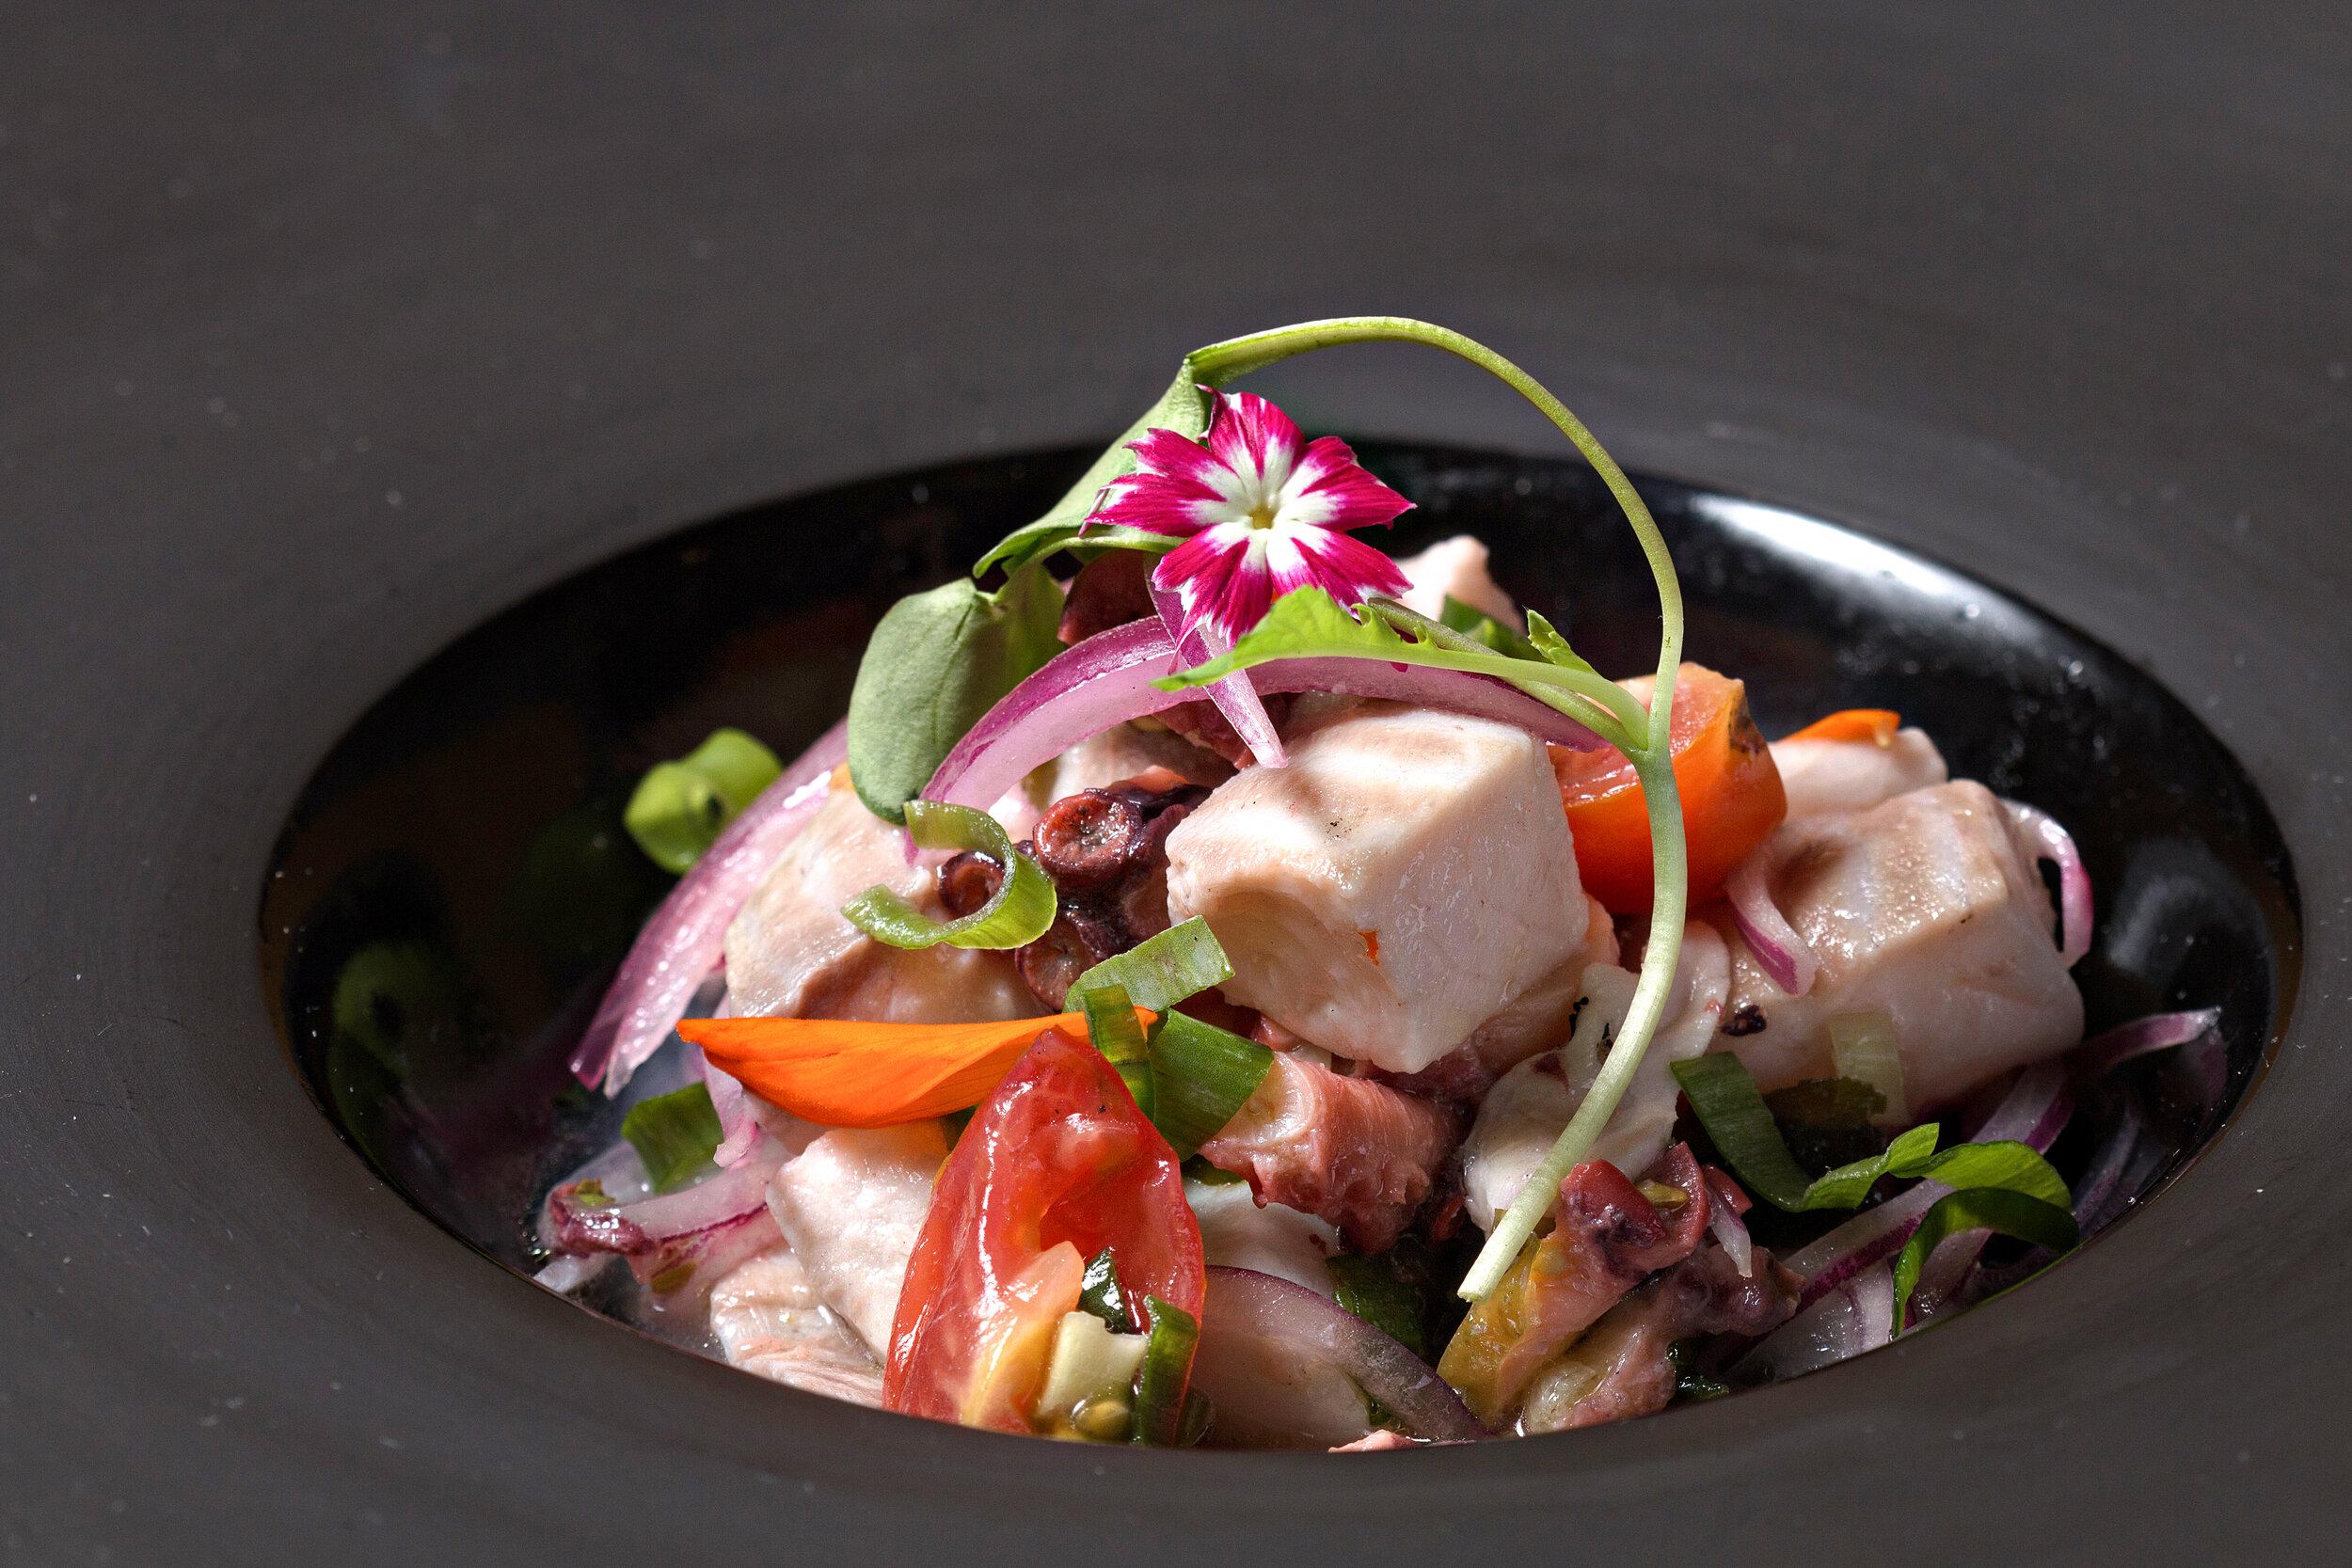 Copy of  Jantar - Entrada - Ceviche de peixe fresco e polvo, milho crocante e algas wakame